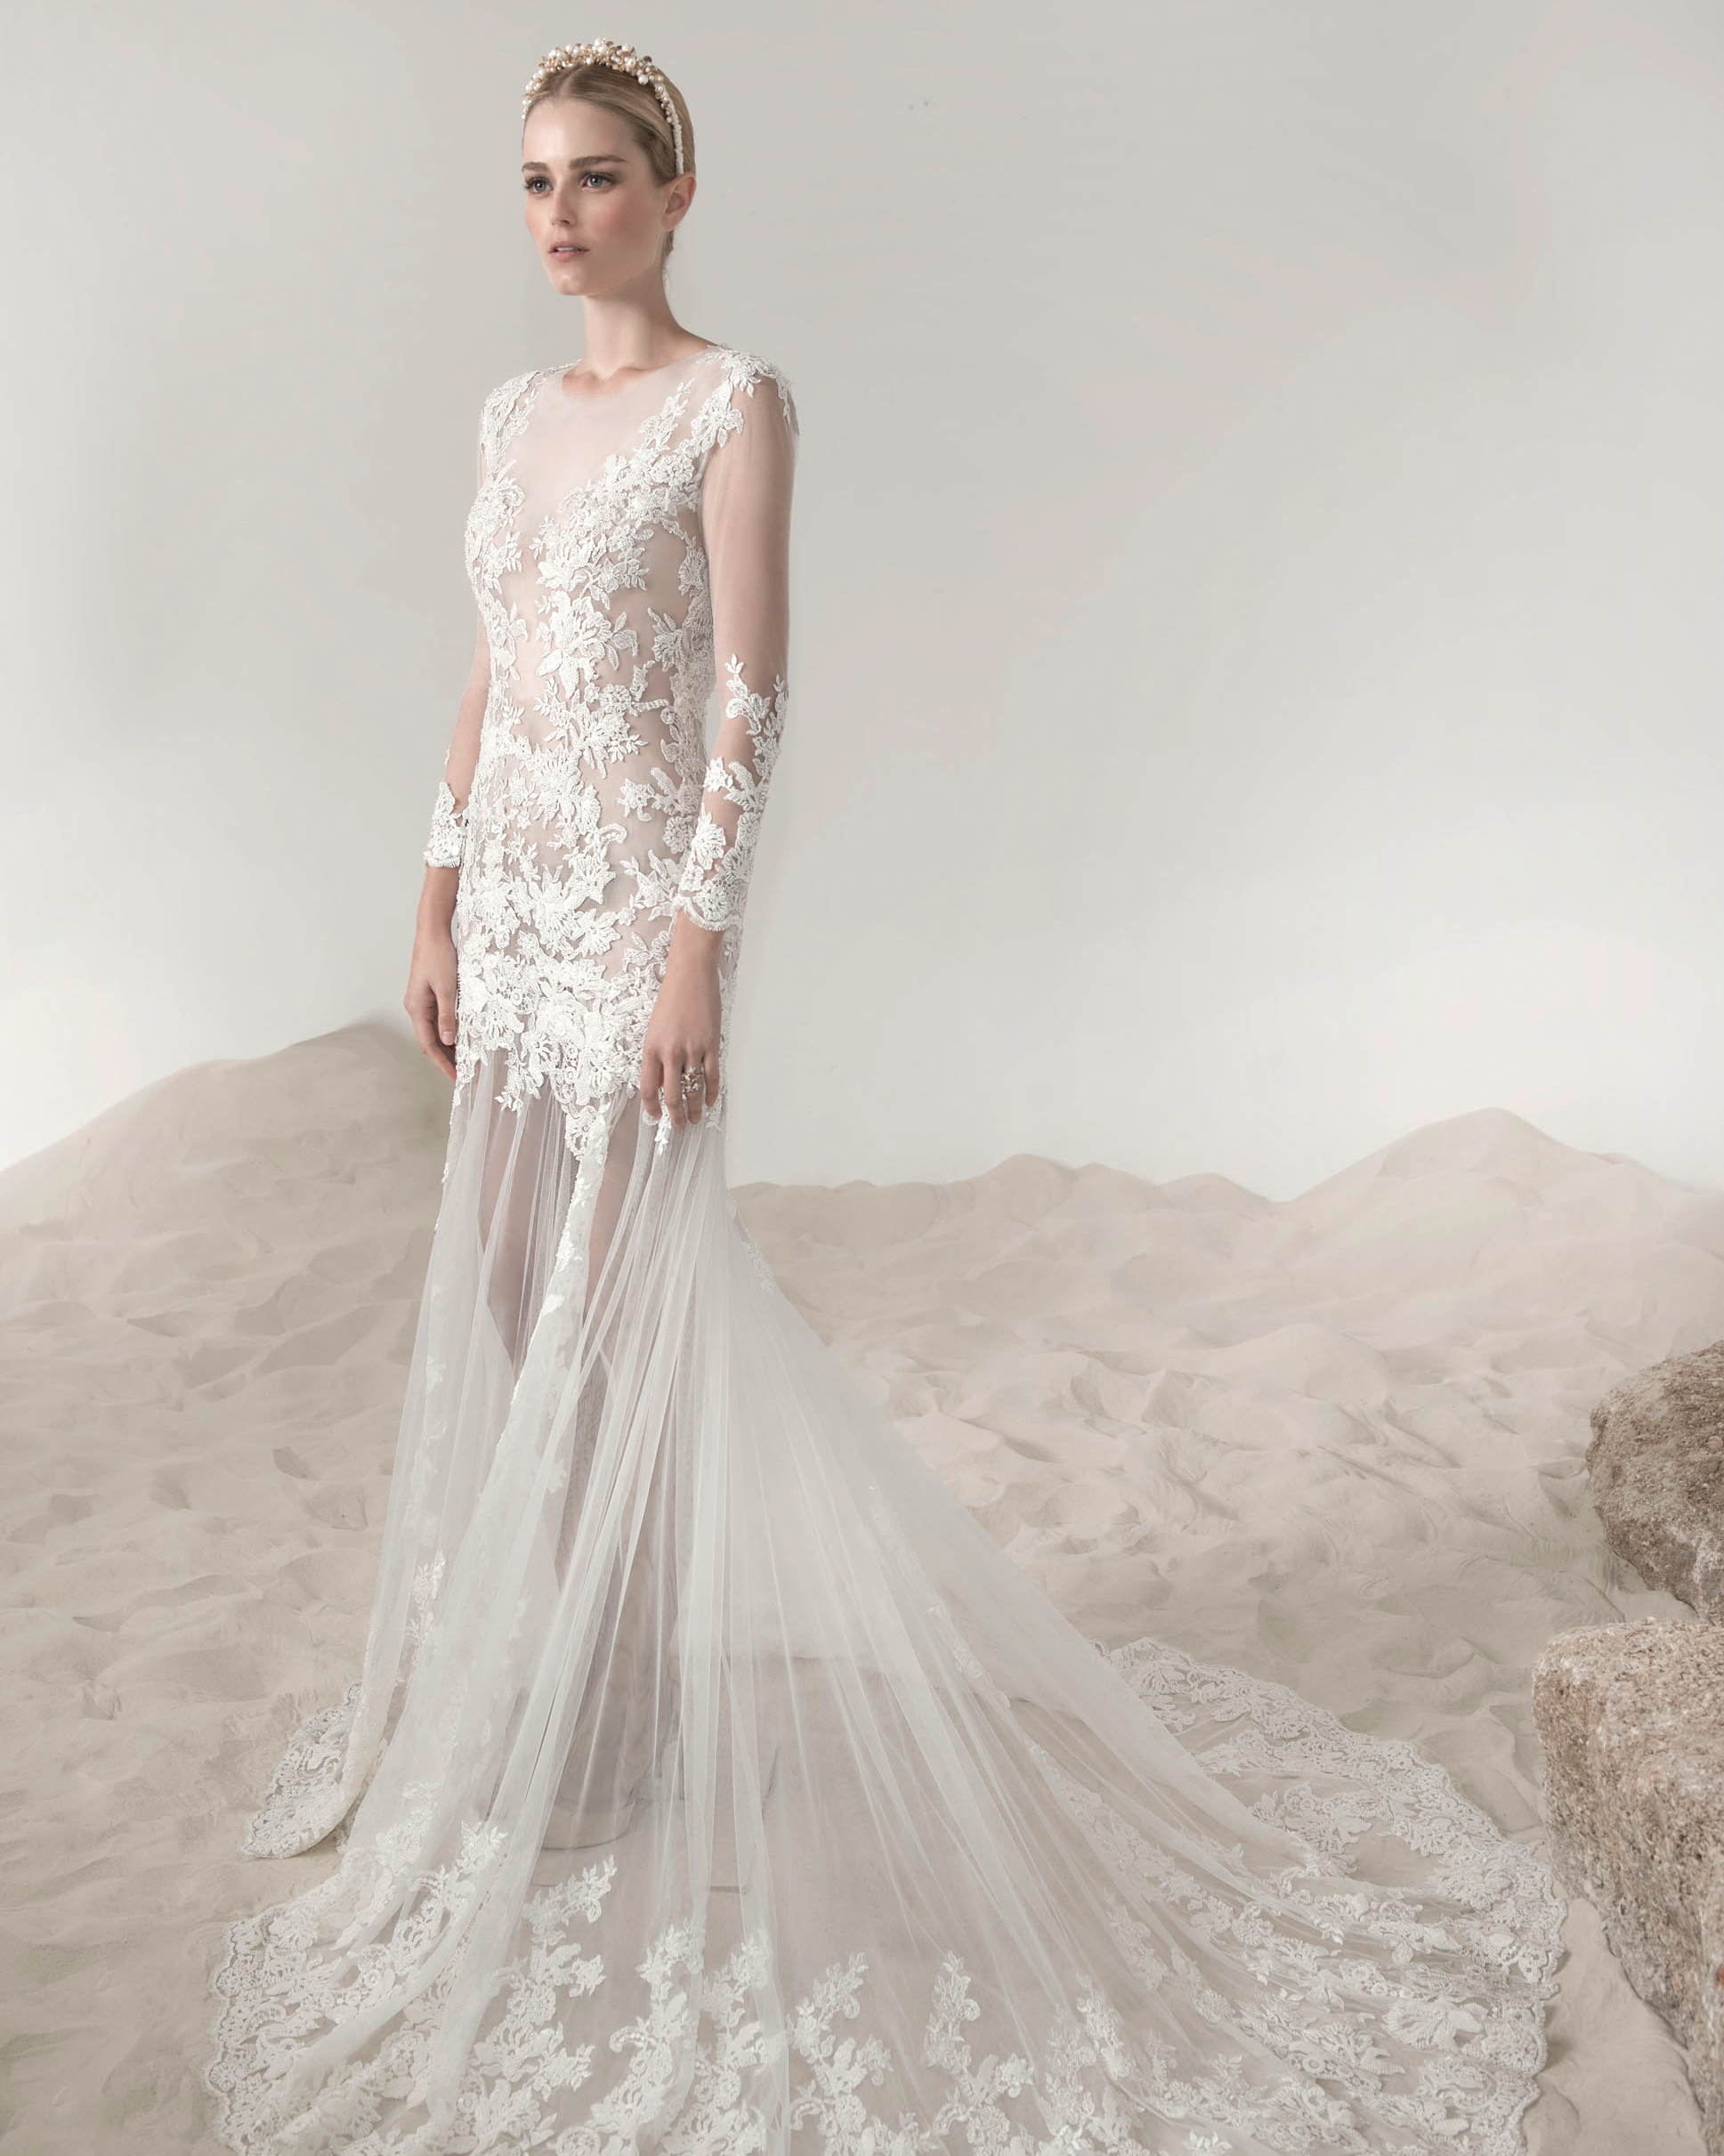 the-lane-winter-bride-lee-petra-grebenau-harper-gown-0116.jpg